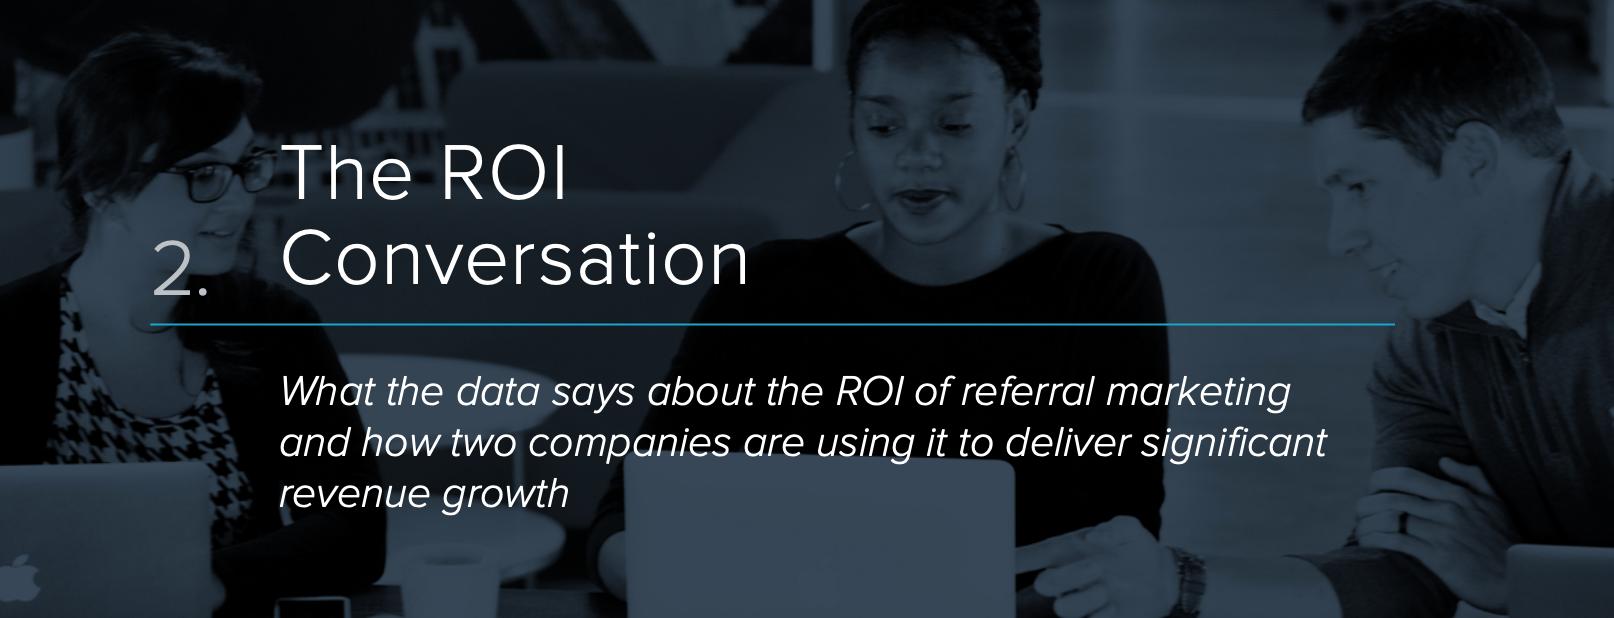 ROI of referral marketing